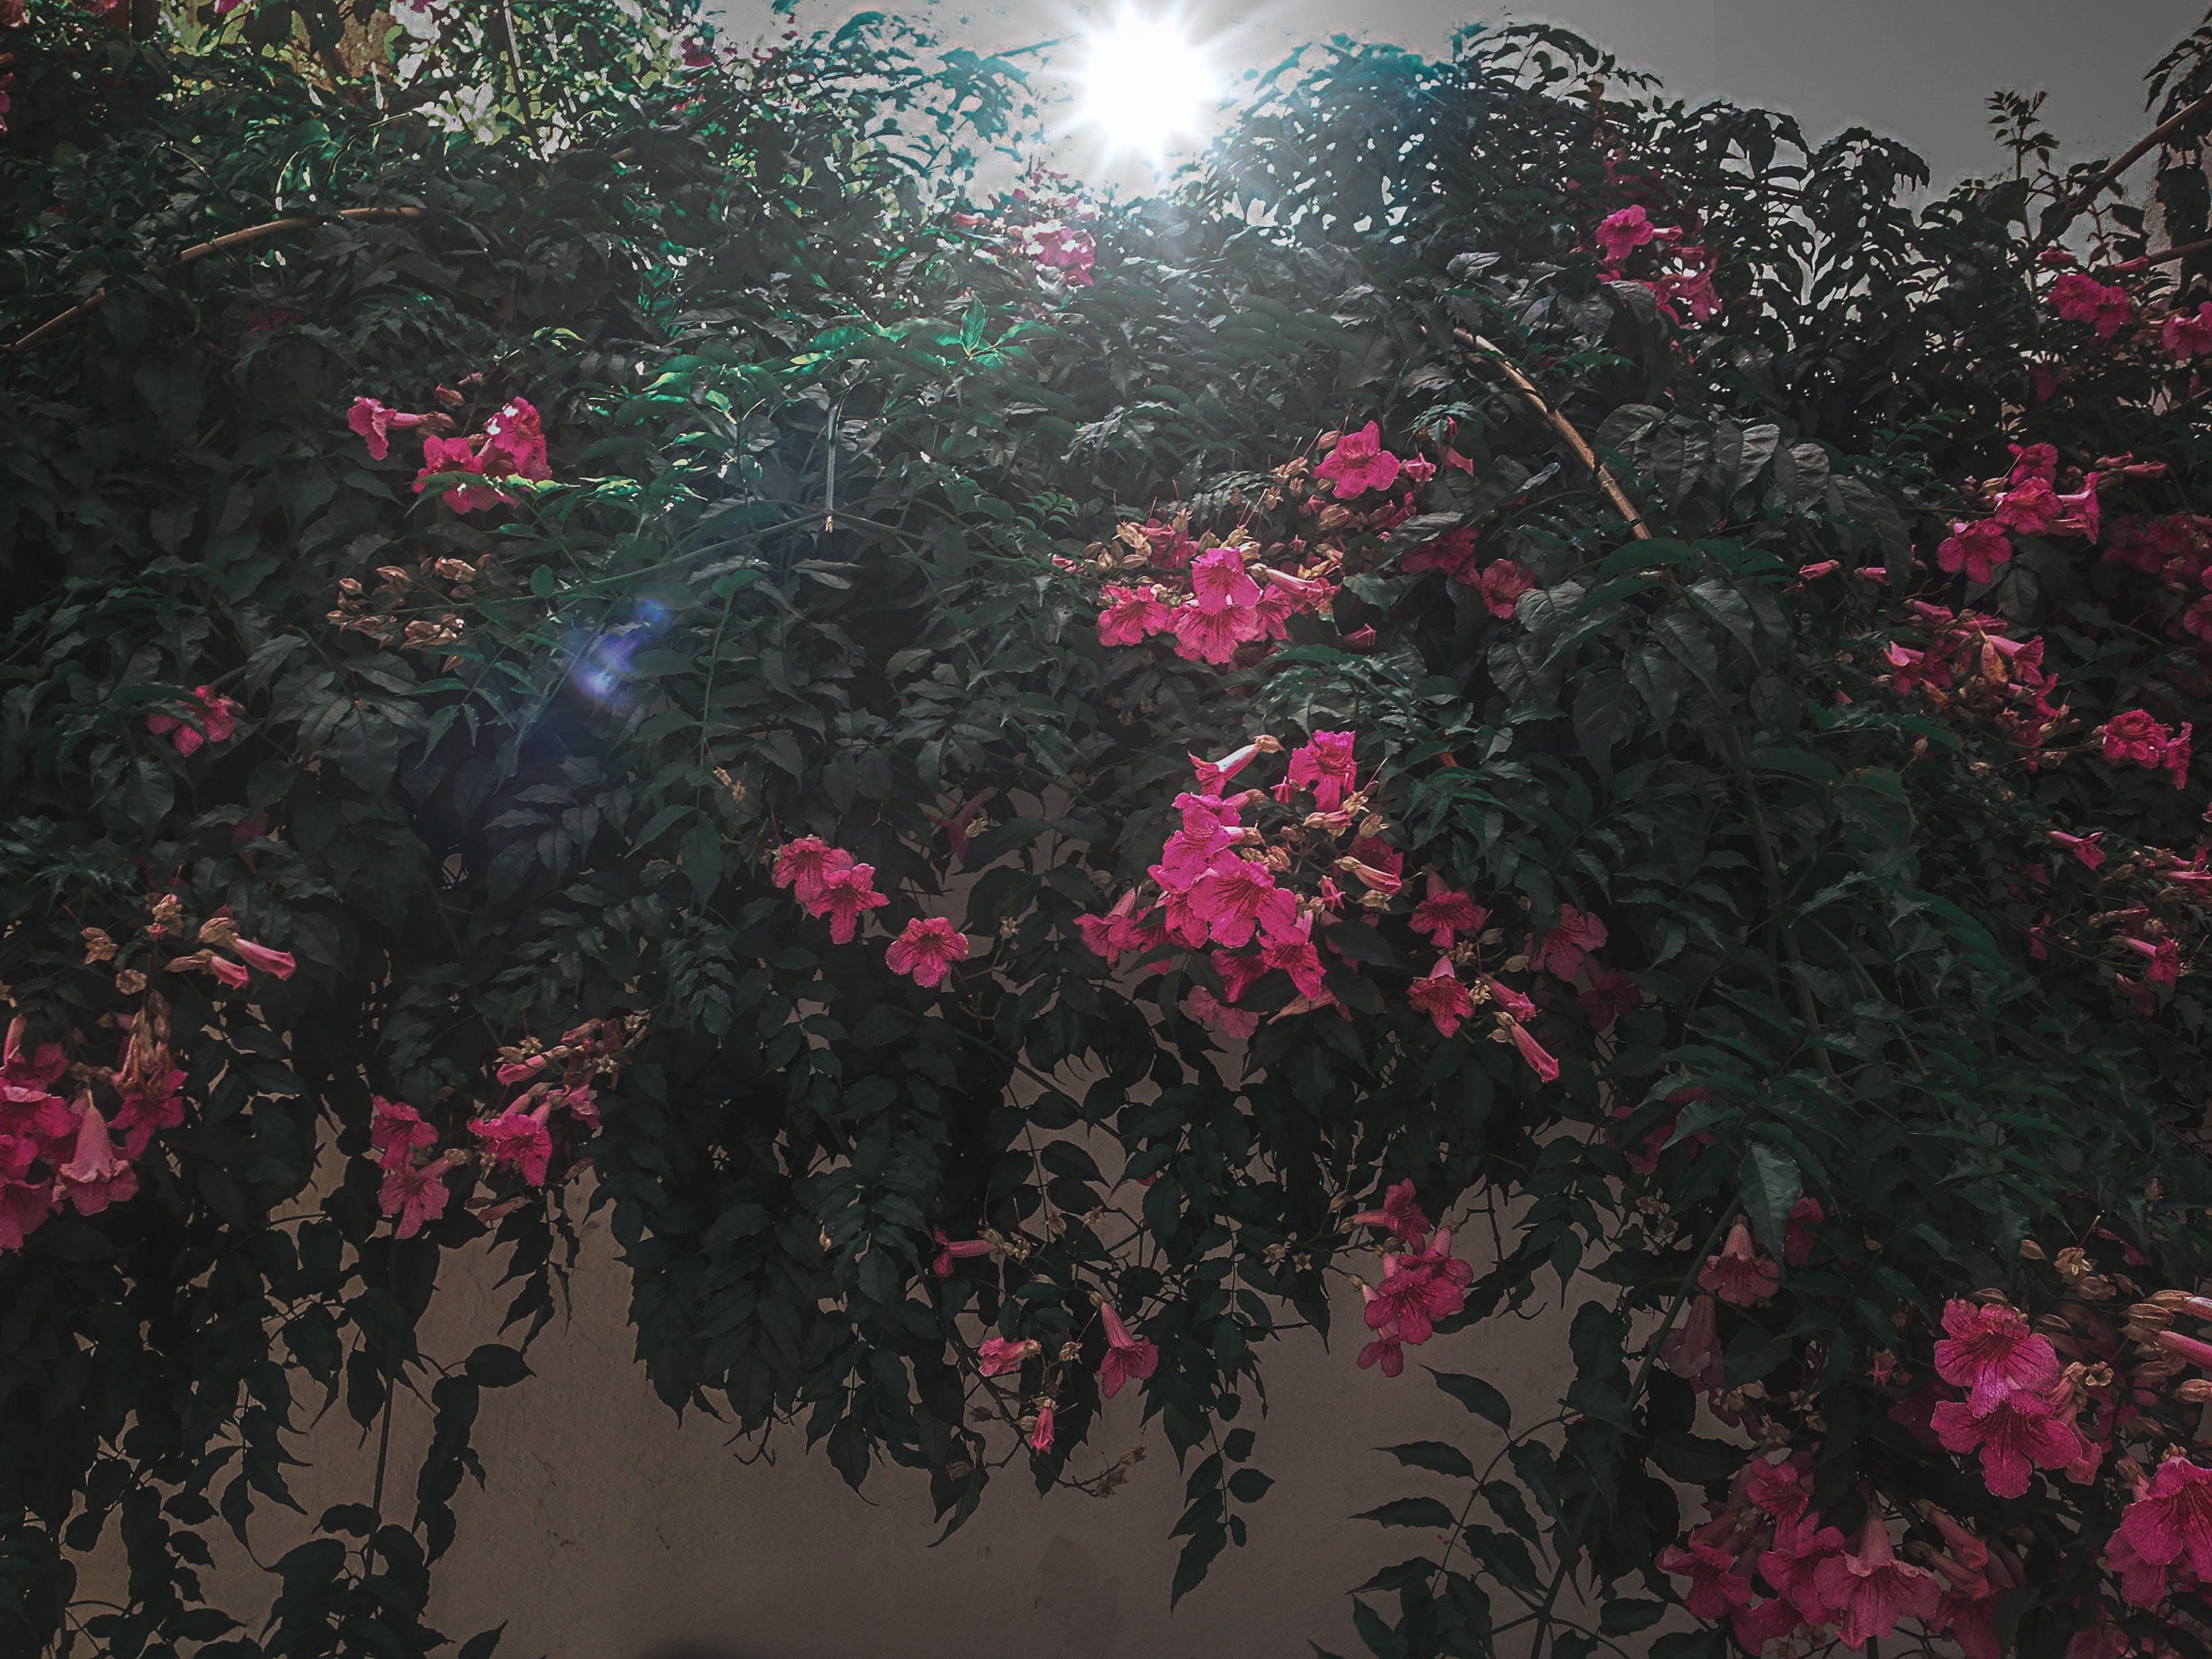 Free stock photo of beautiful flower, flower, nature, nature photography